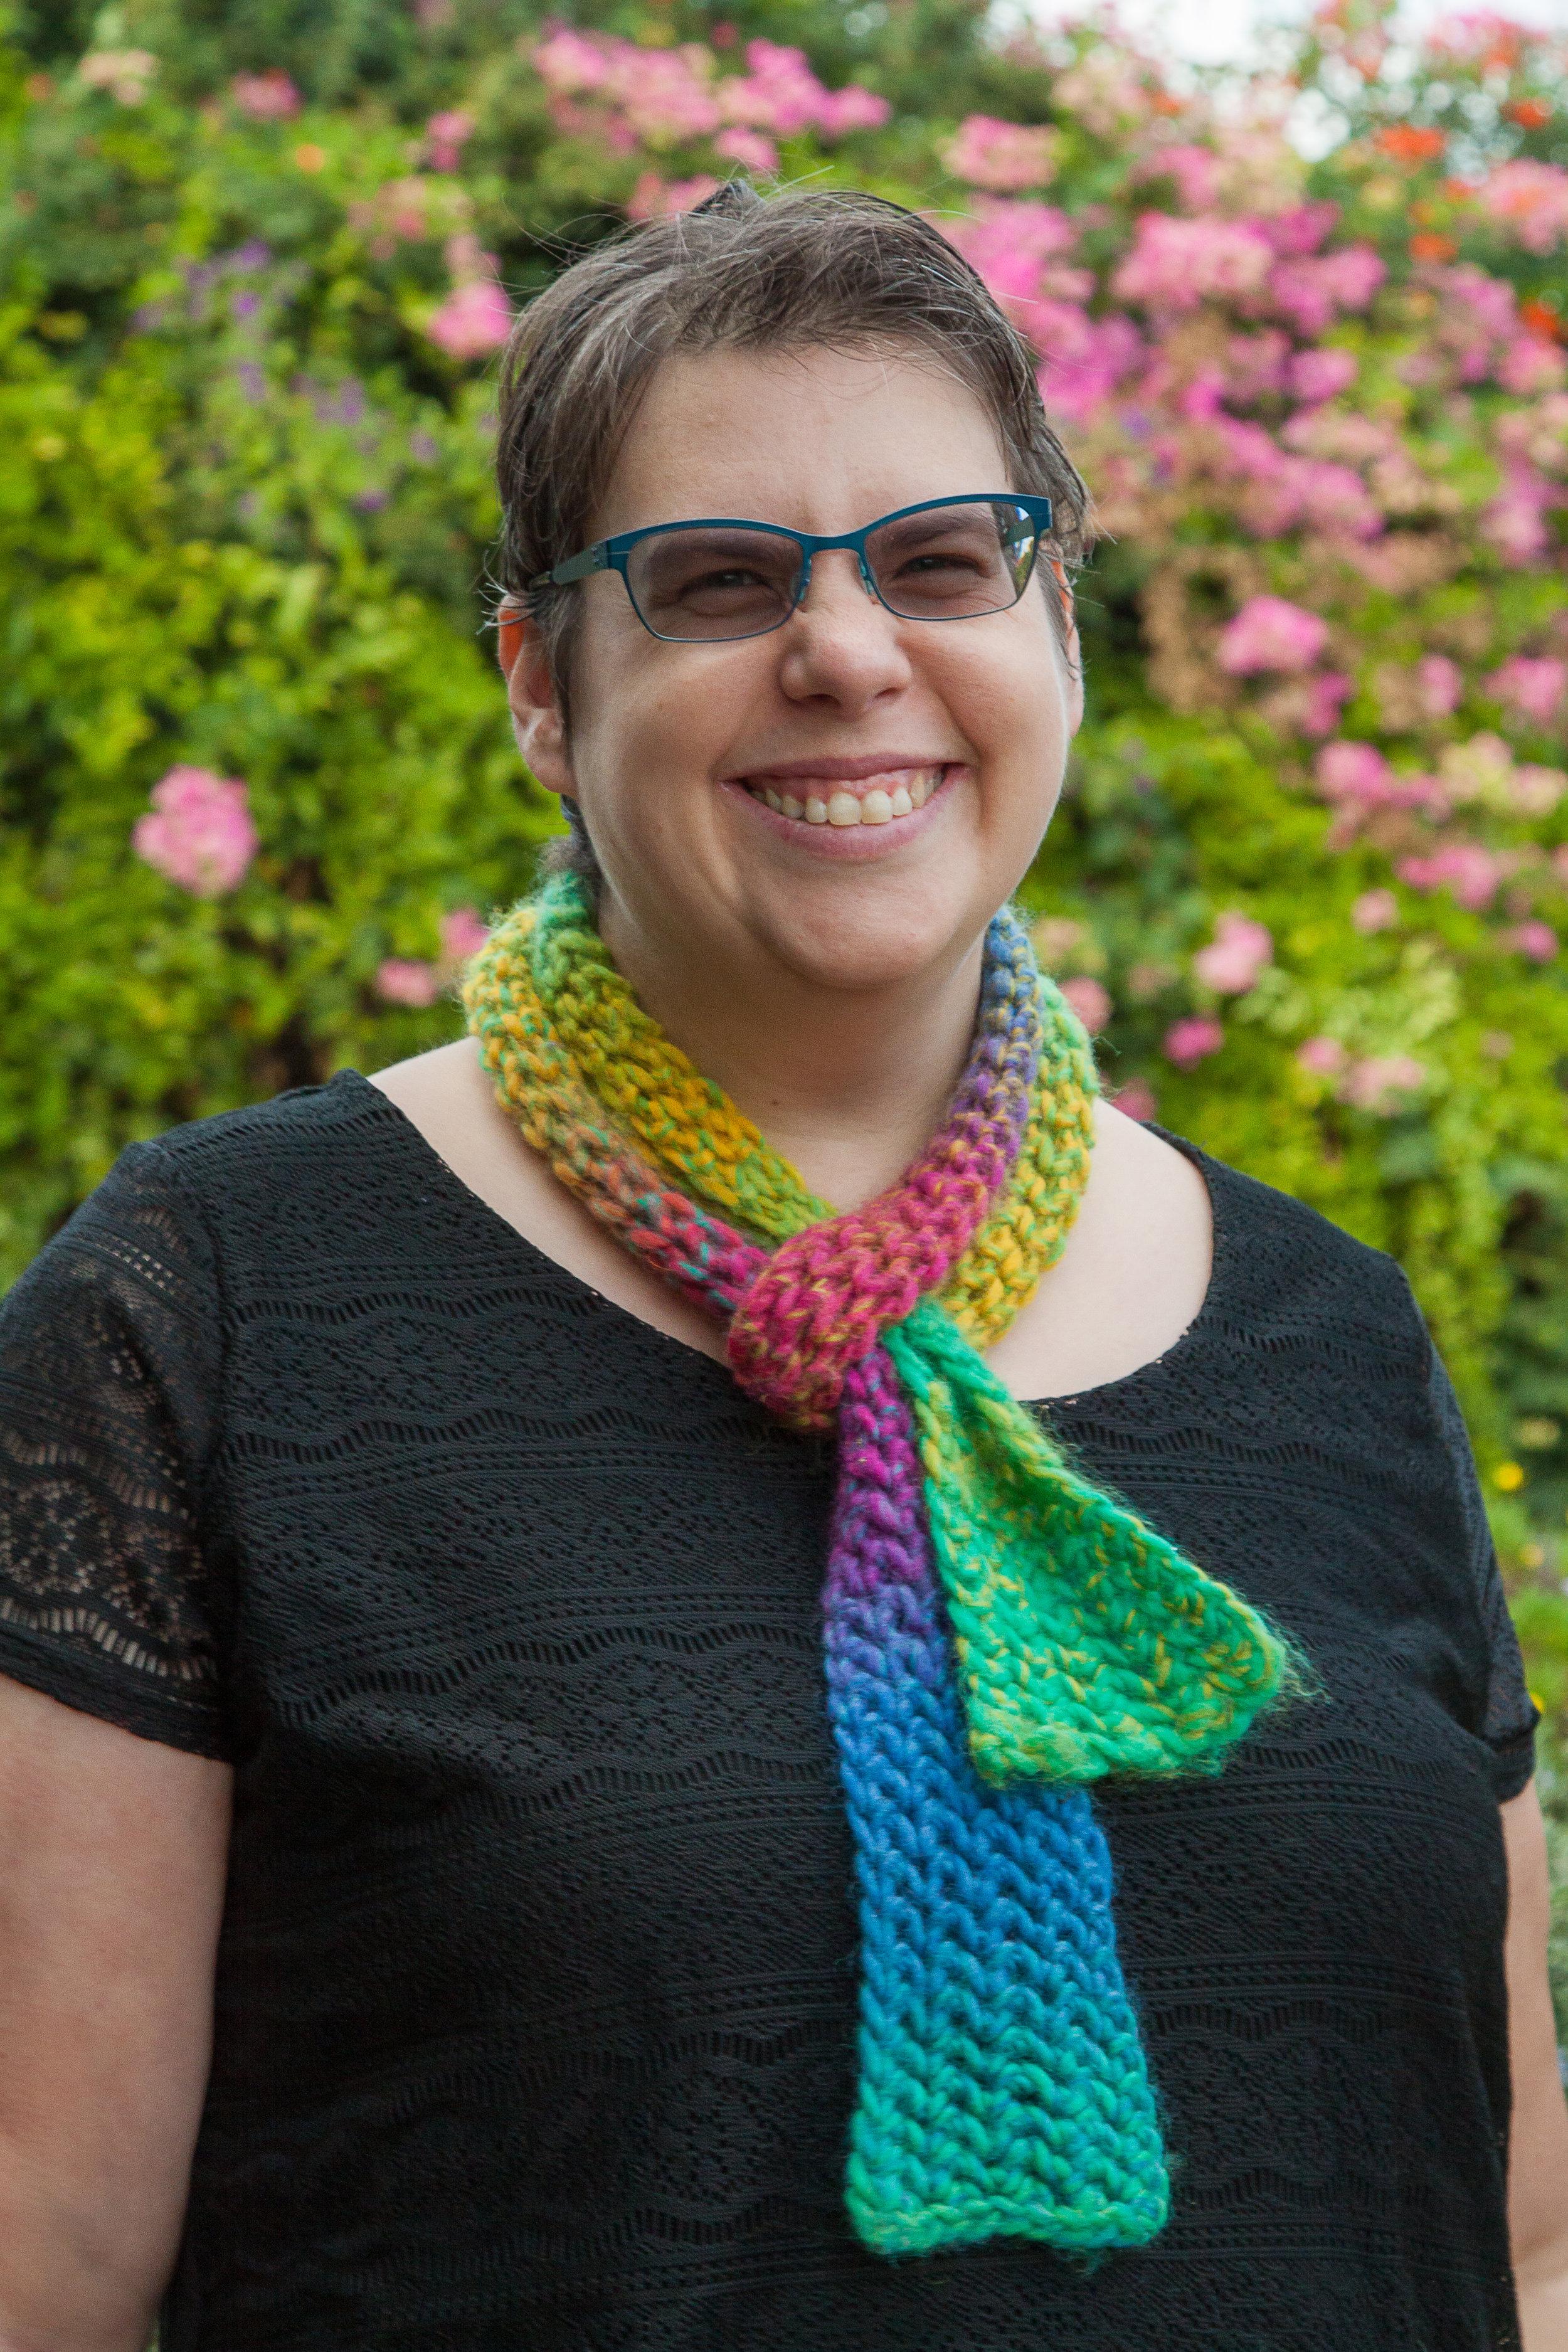 Dr. Abigail Weissman